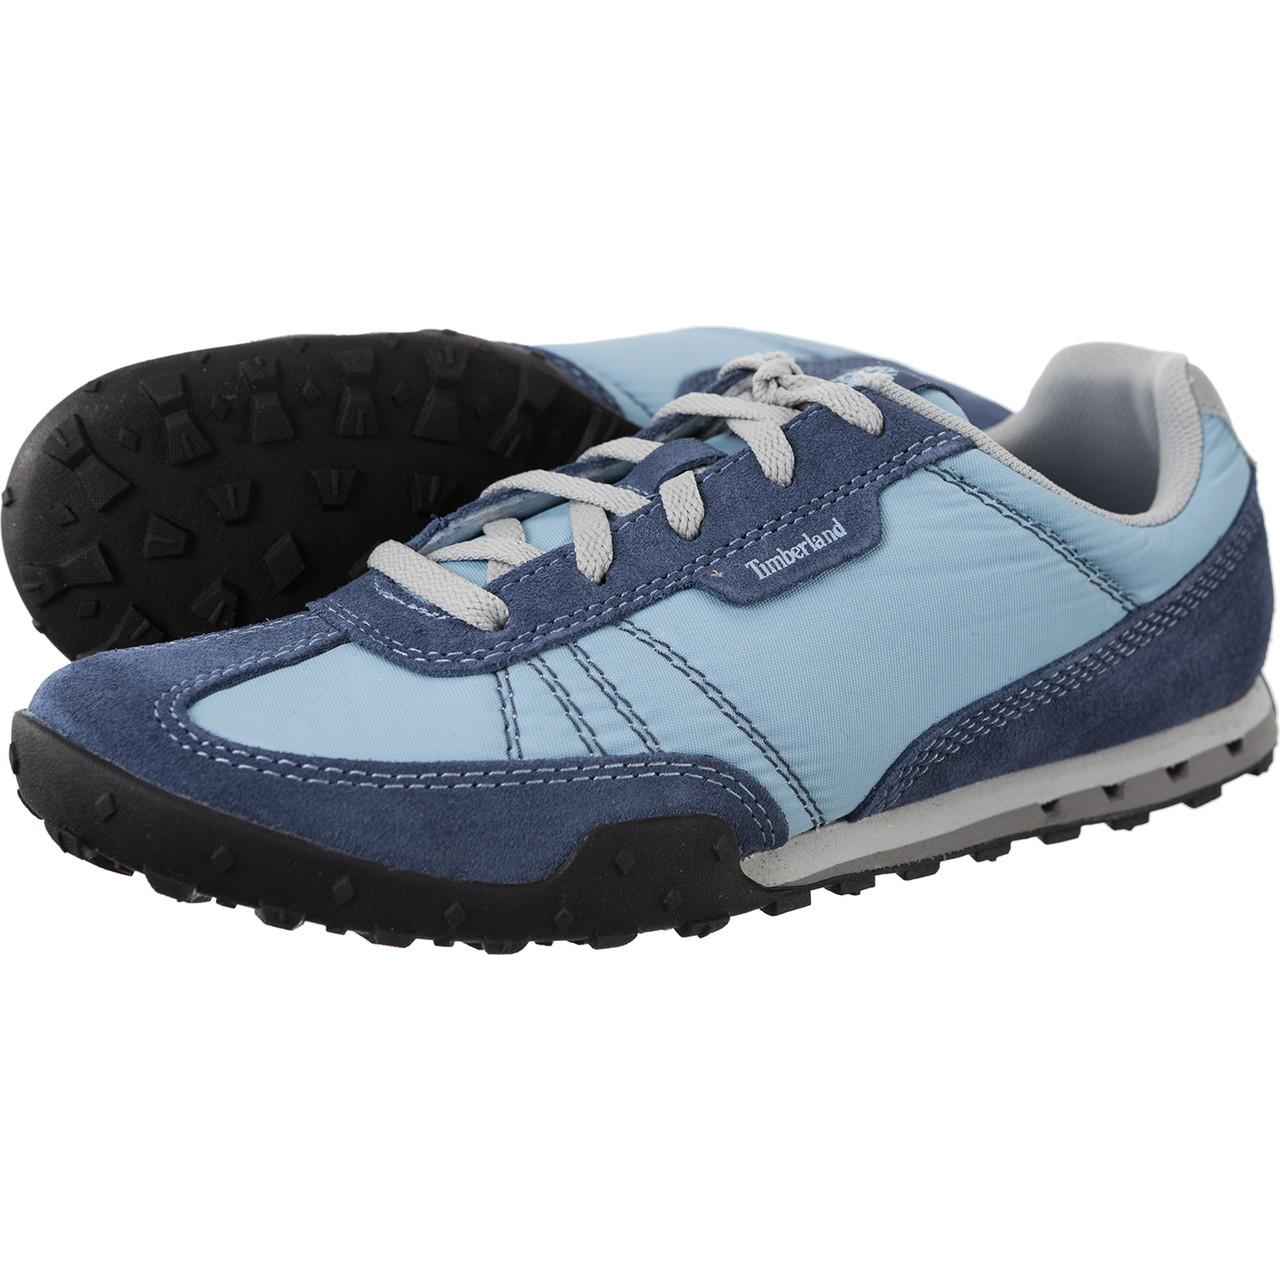 Timberland Greeley obuwie